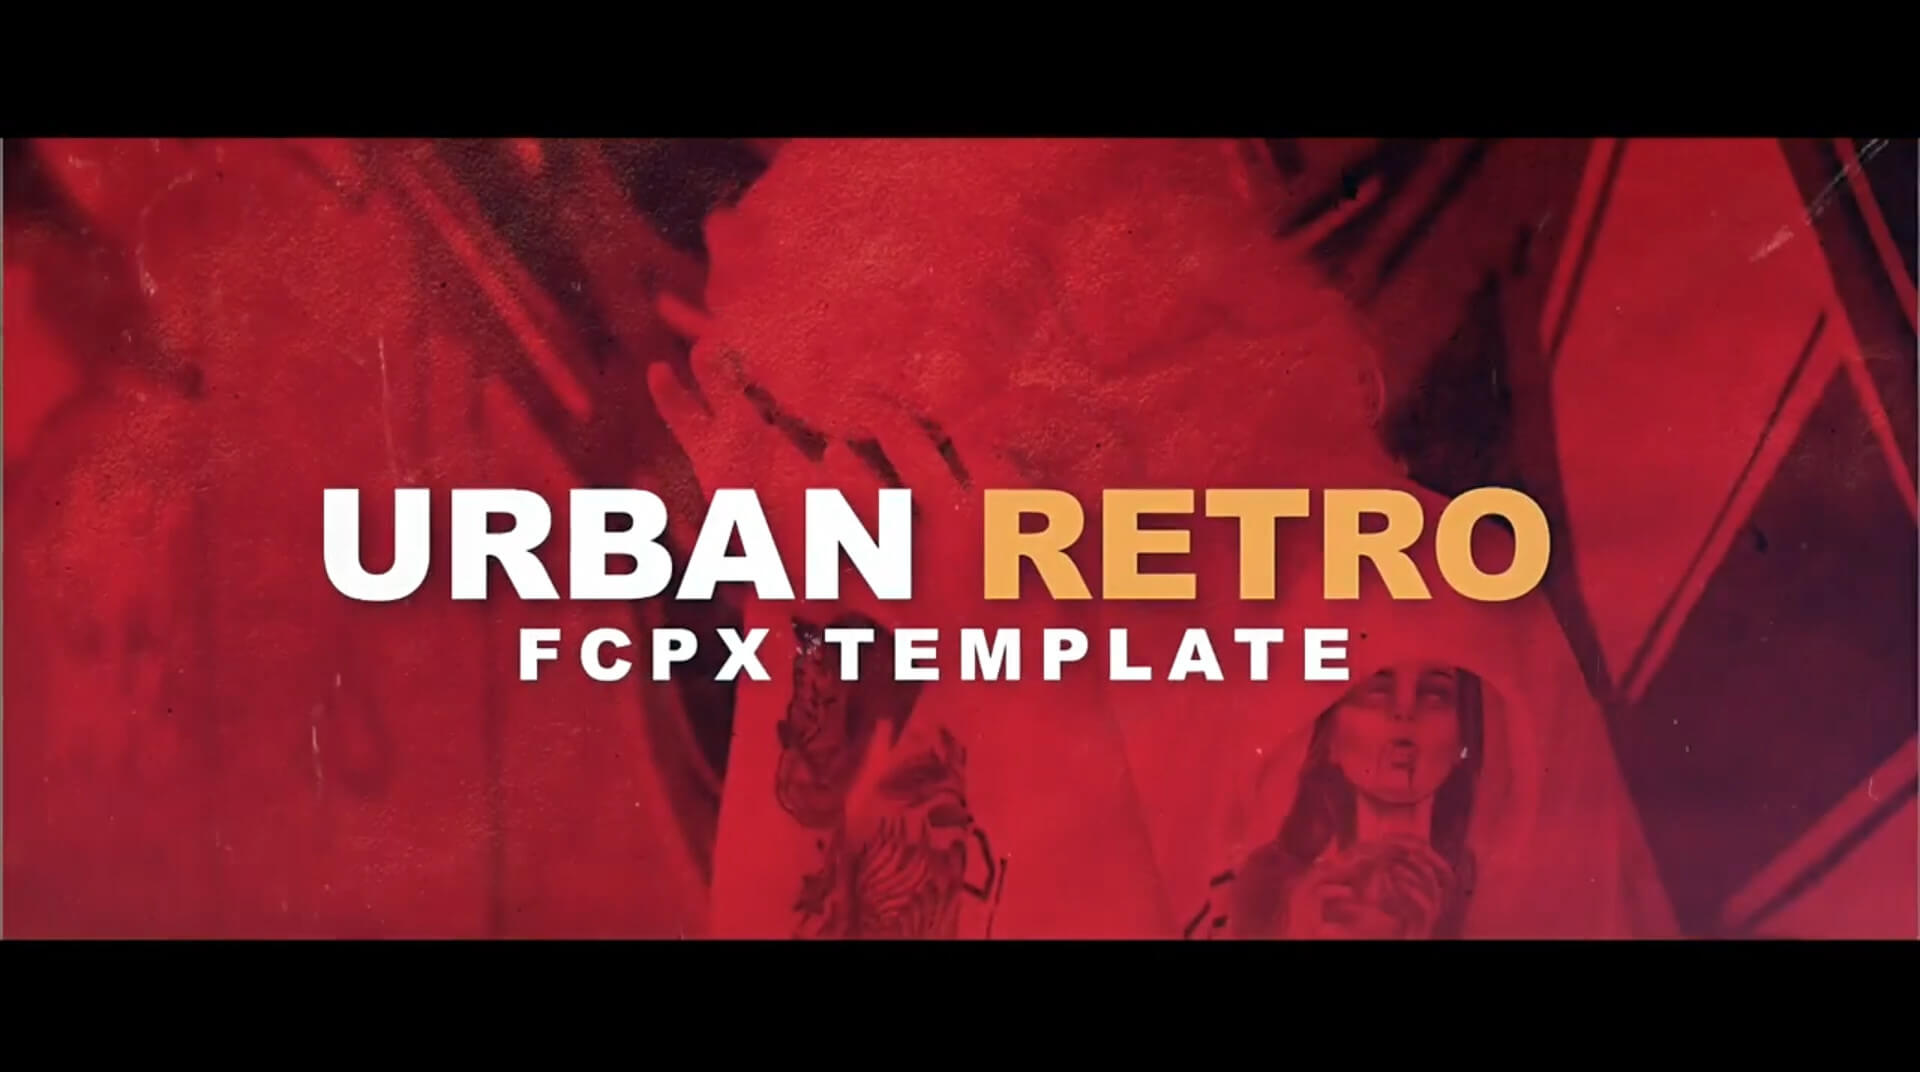 Fcpx主题模板 现代流行复古个性片头个人写真模板 Urban Retro